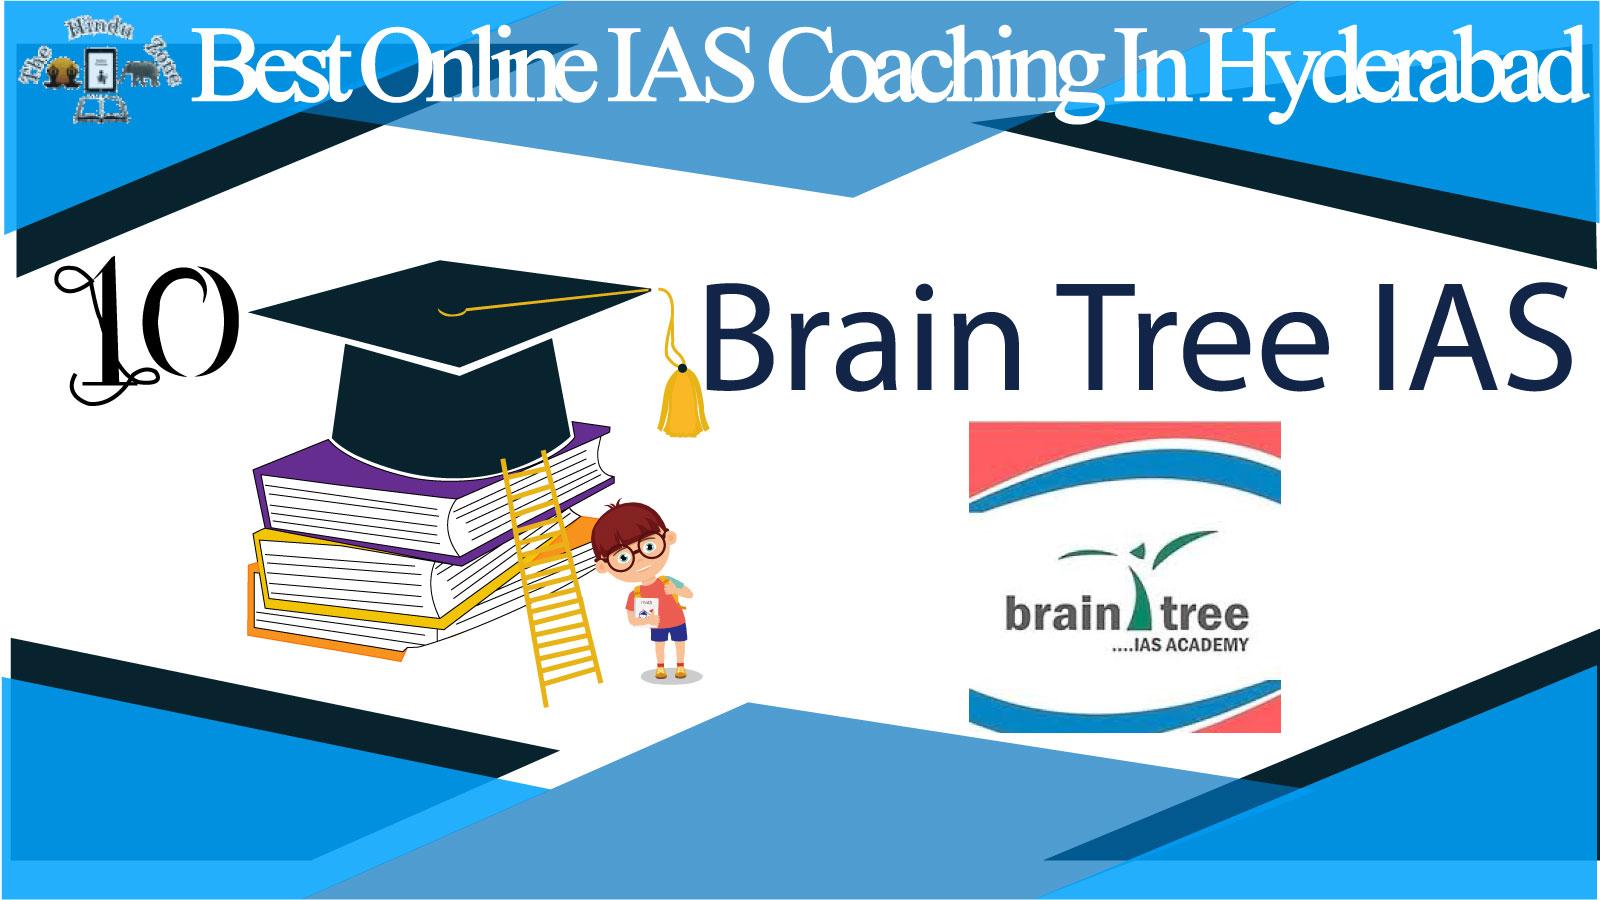 Brain Tree IAS Coaching in Hyderabad